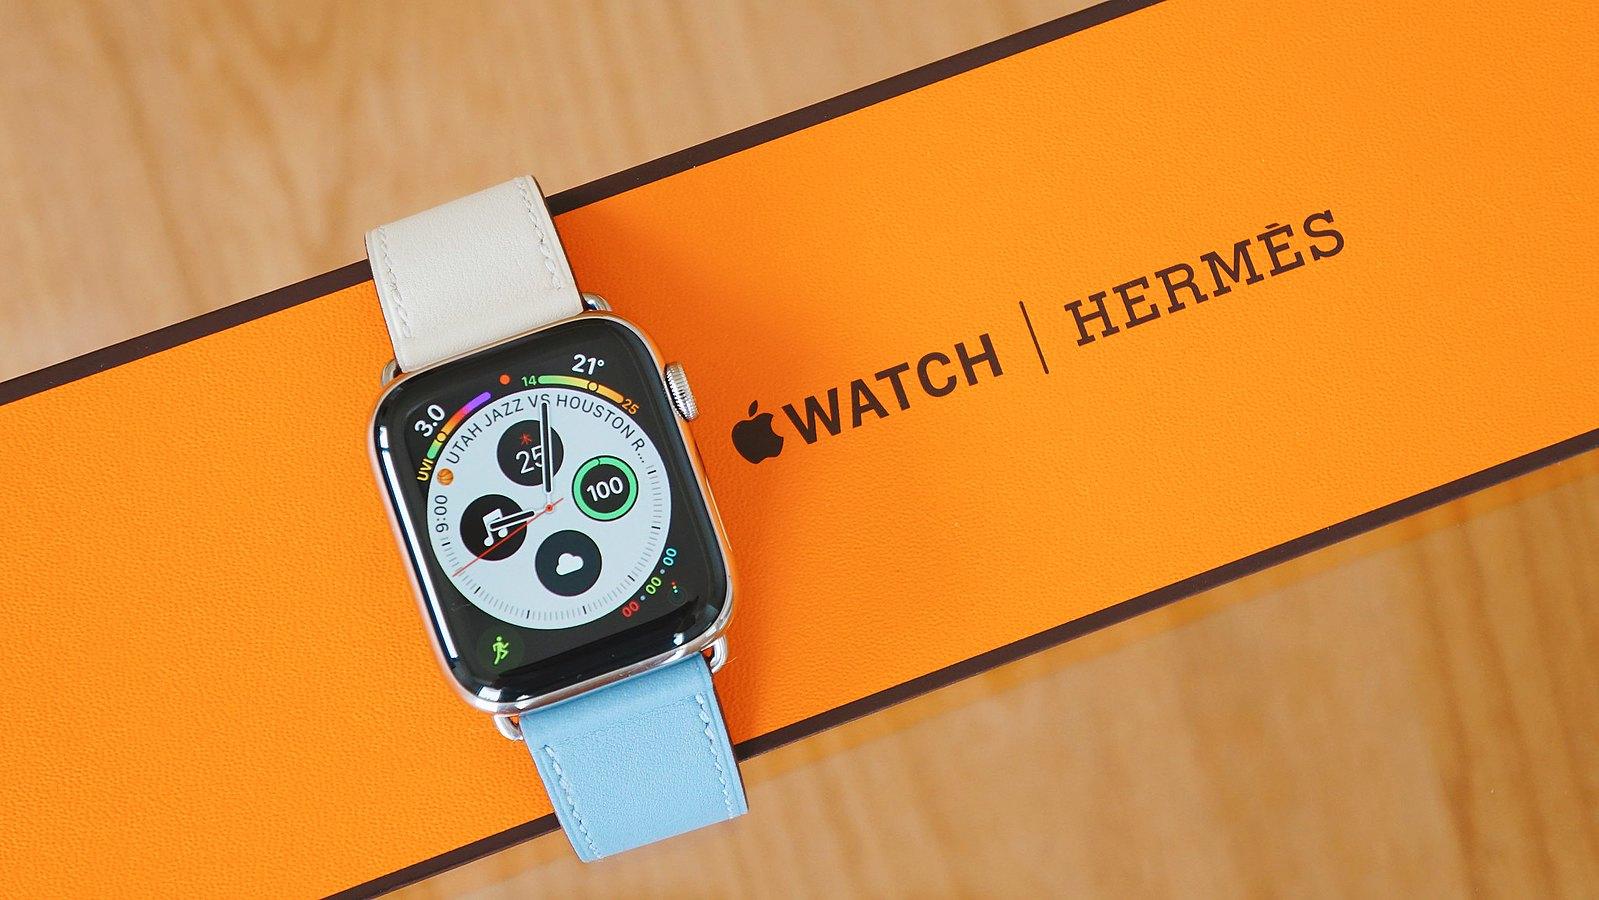 Apple Watch Hermès ヴォー・スウィフト シンプルトゥールレザーストラップ レビュー